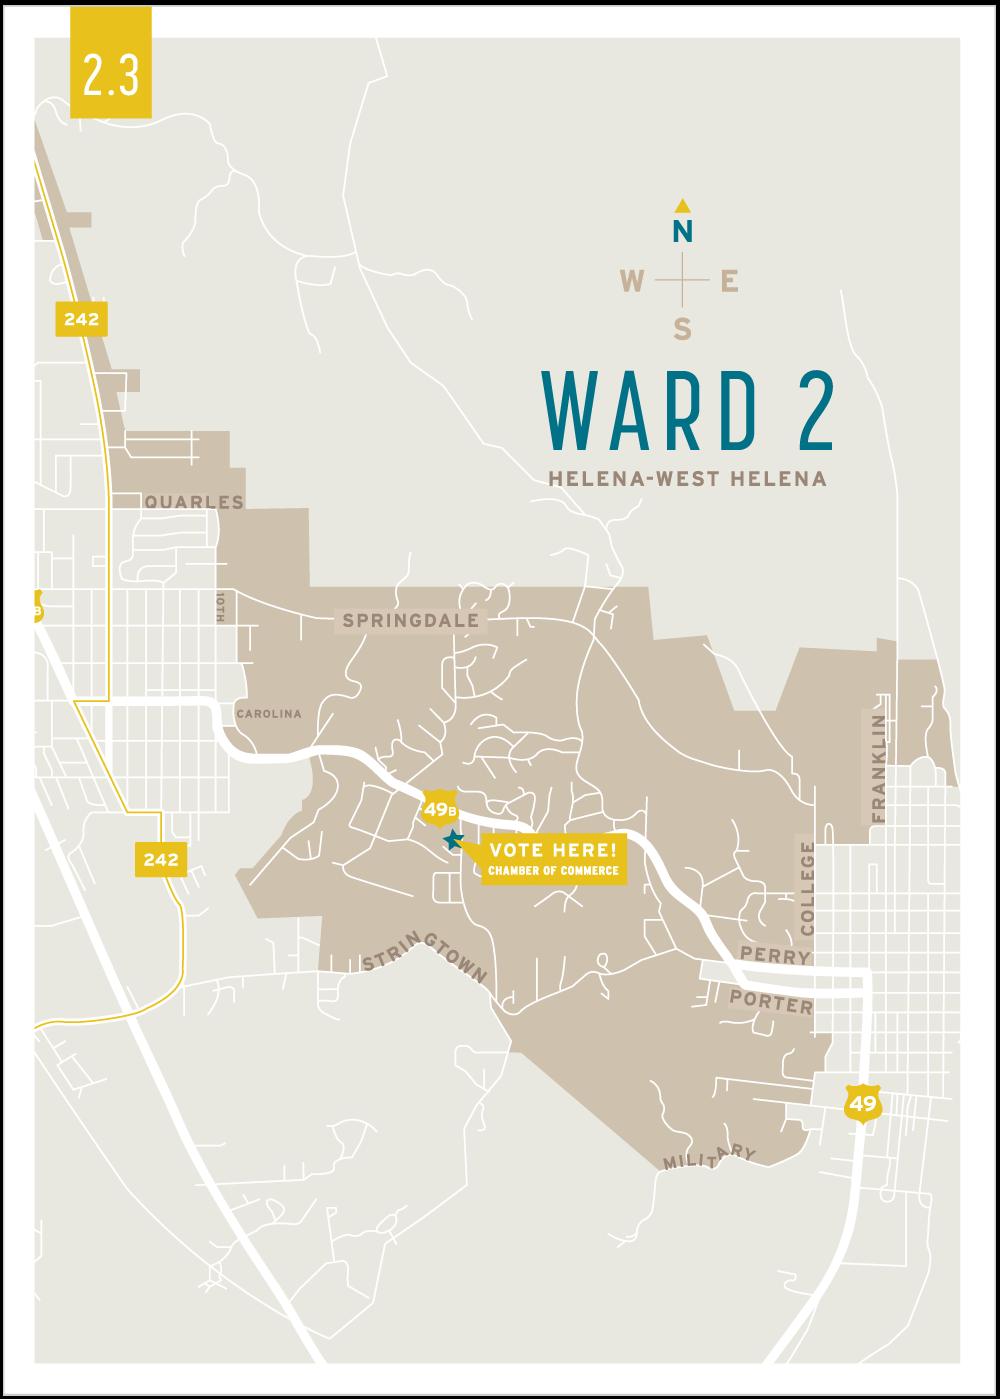 helena-guide-map-ward2.png